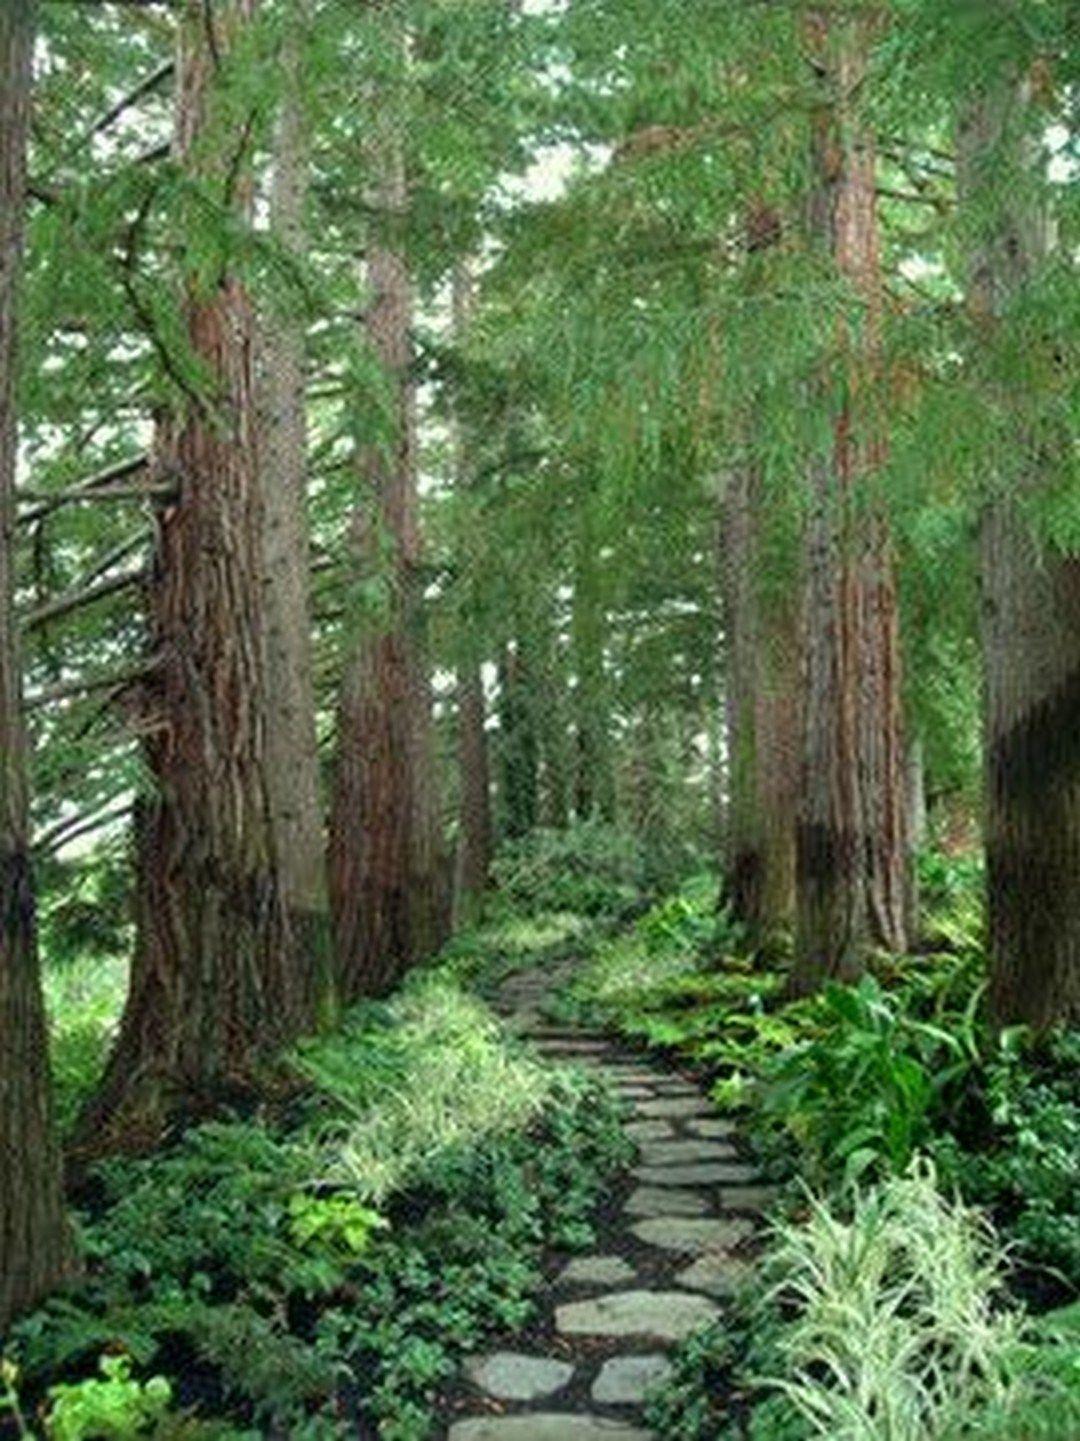 Love The Blending Of Garden Into Forest 35 Inspiration Photos 35 Onechitecture Landscape Design Low Maintenance Garden Design Easy Landscaping